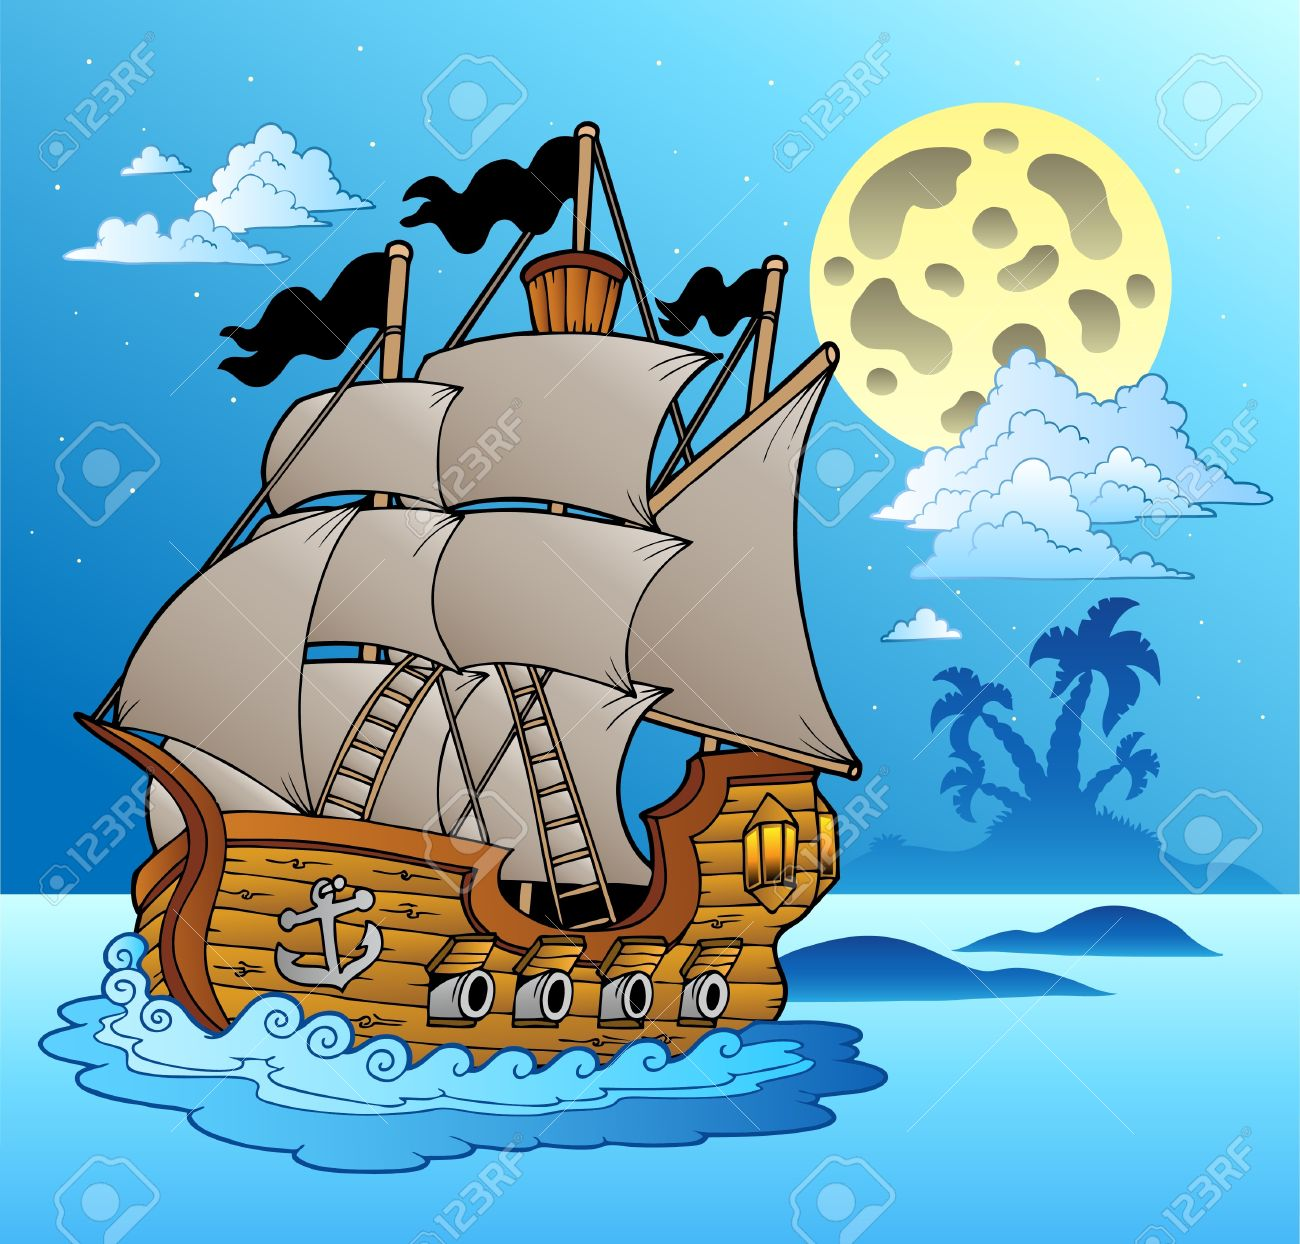 Old vessel in night seascape - vector illustration. Stock Vector - 8985696